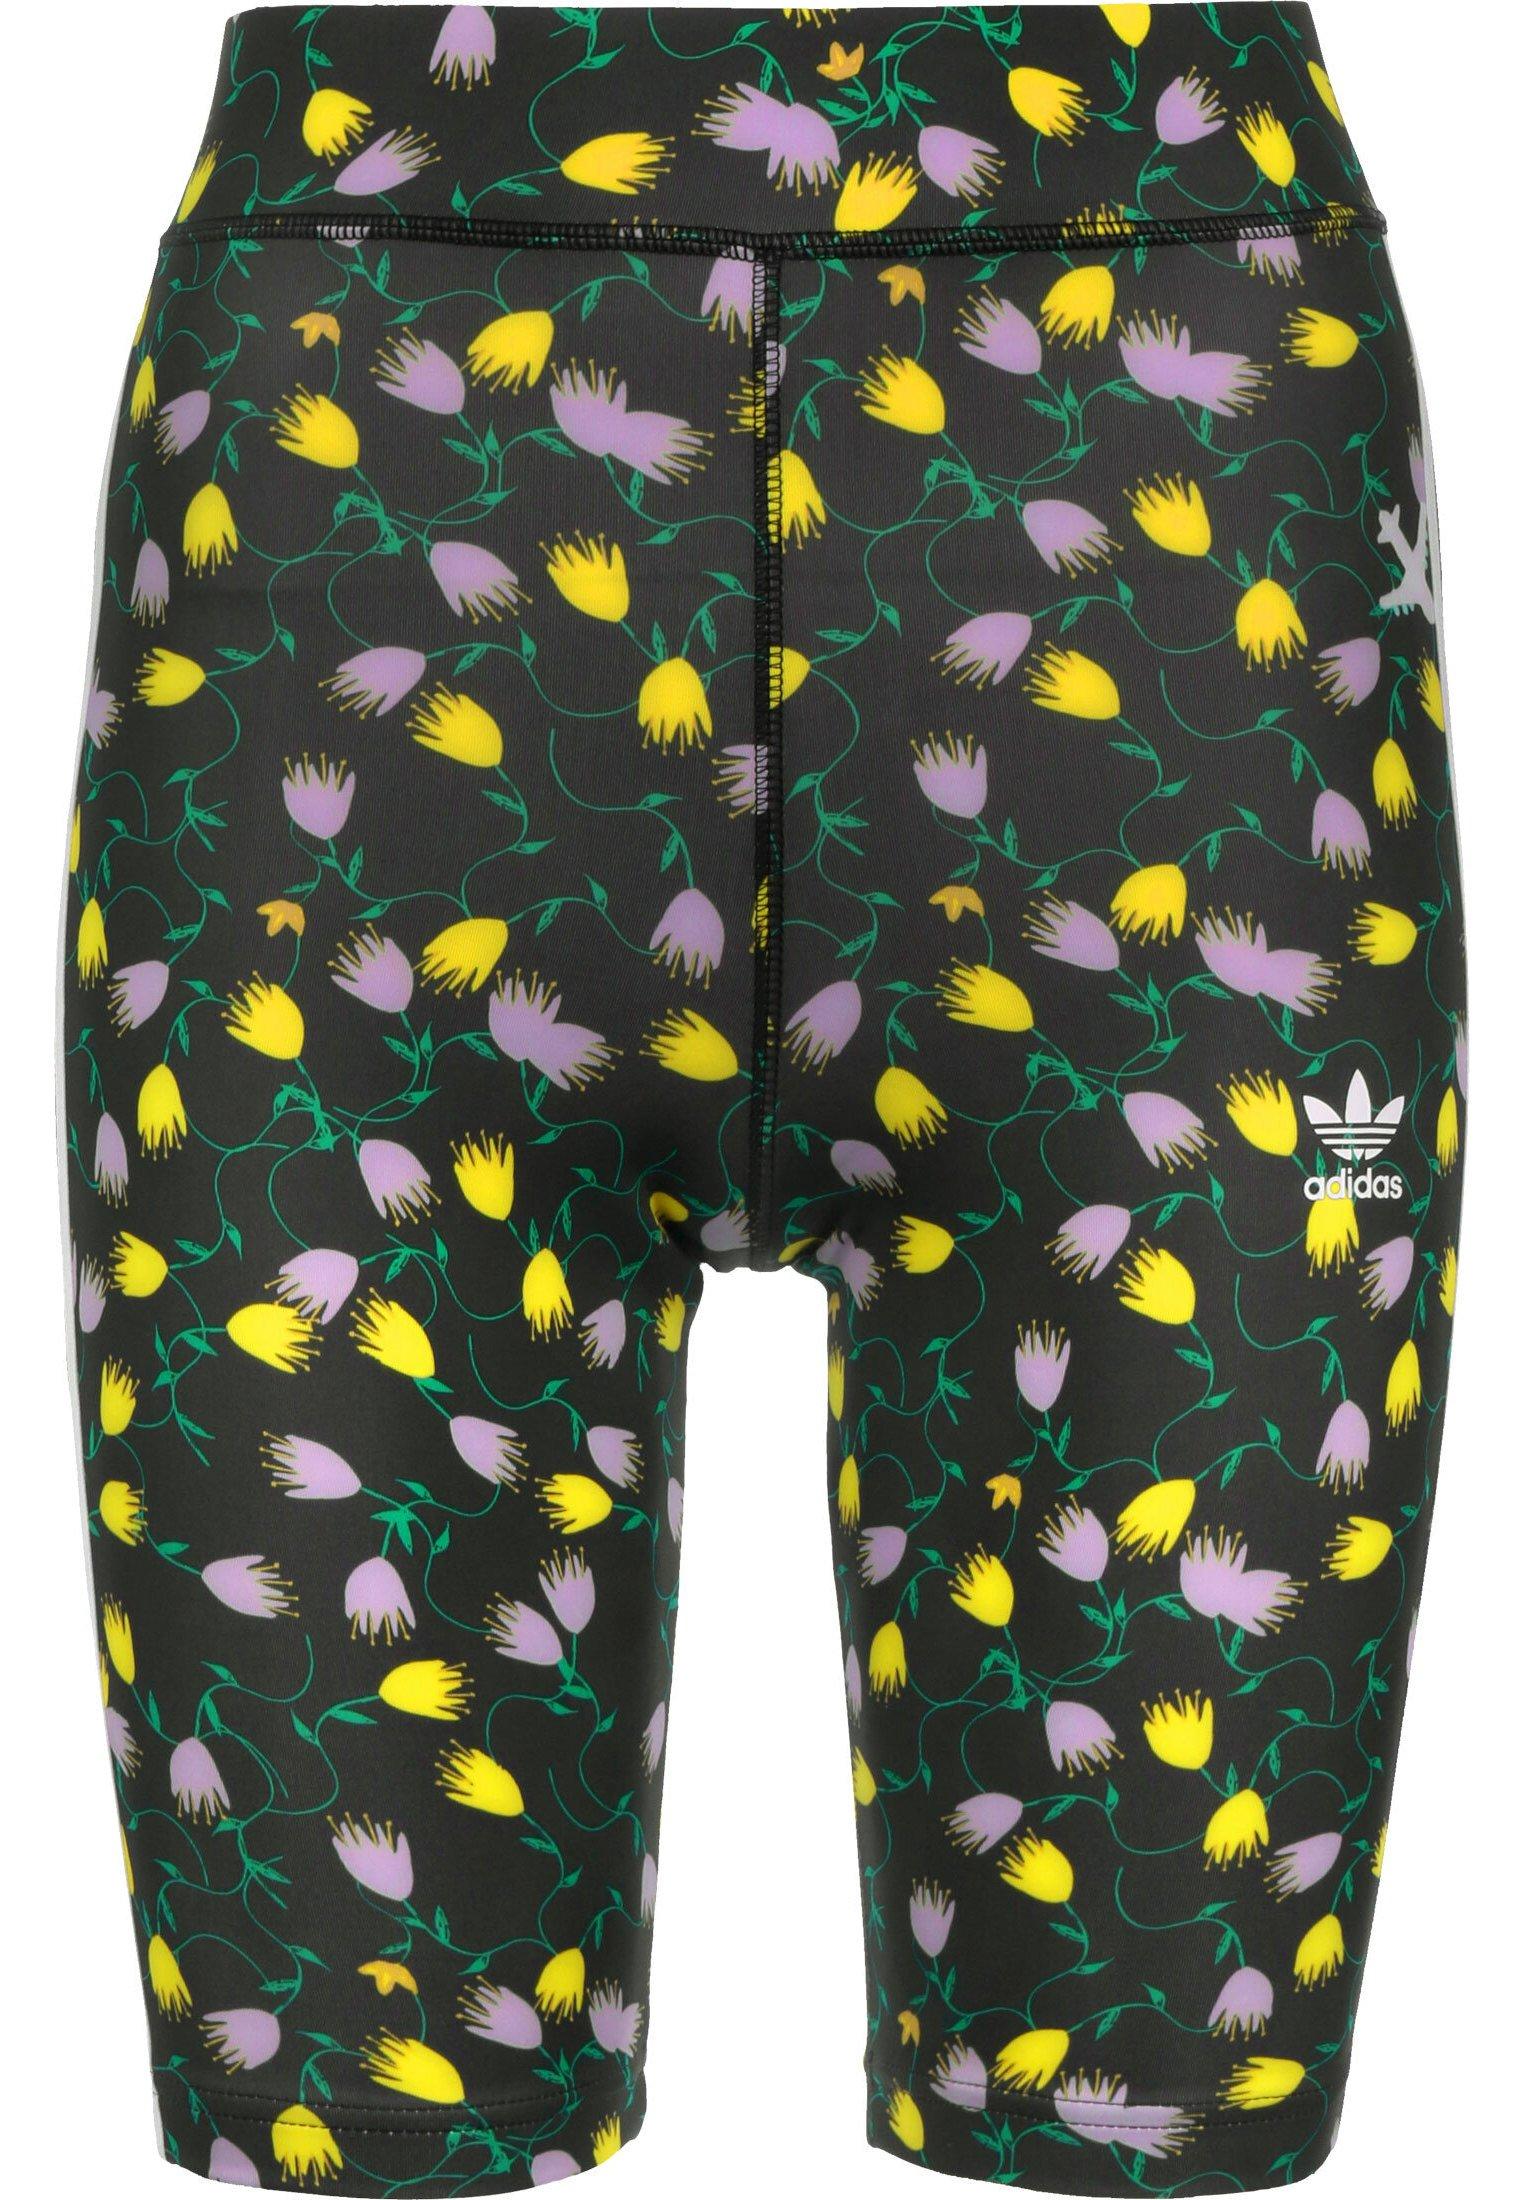 Adidas en ligne | Nouvelle collection sur ZALANDO